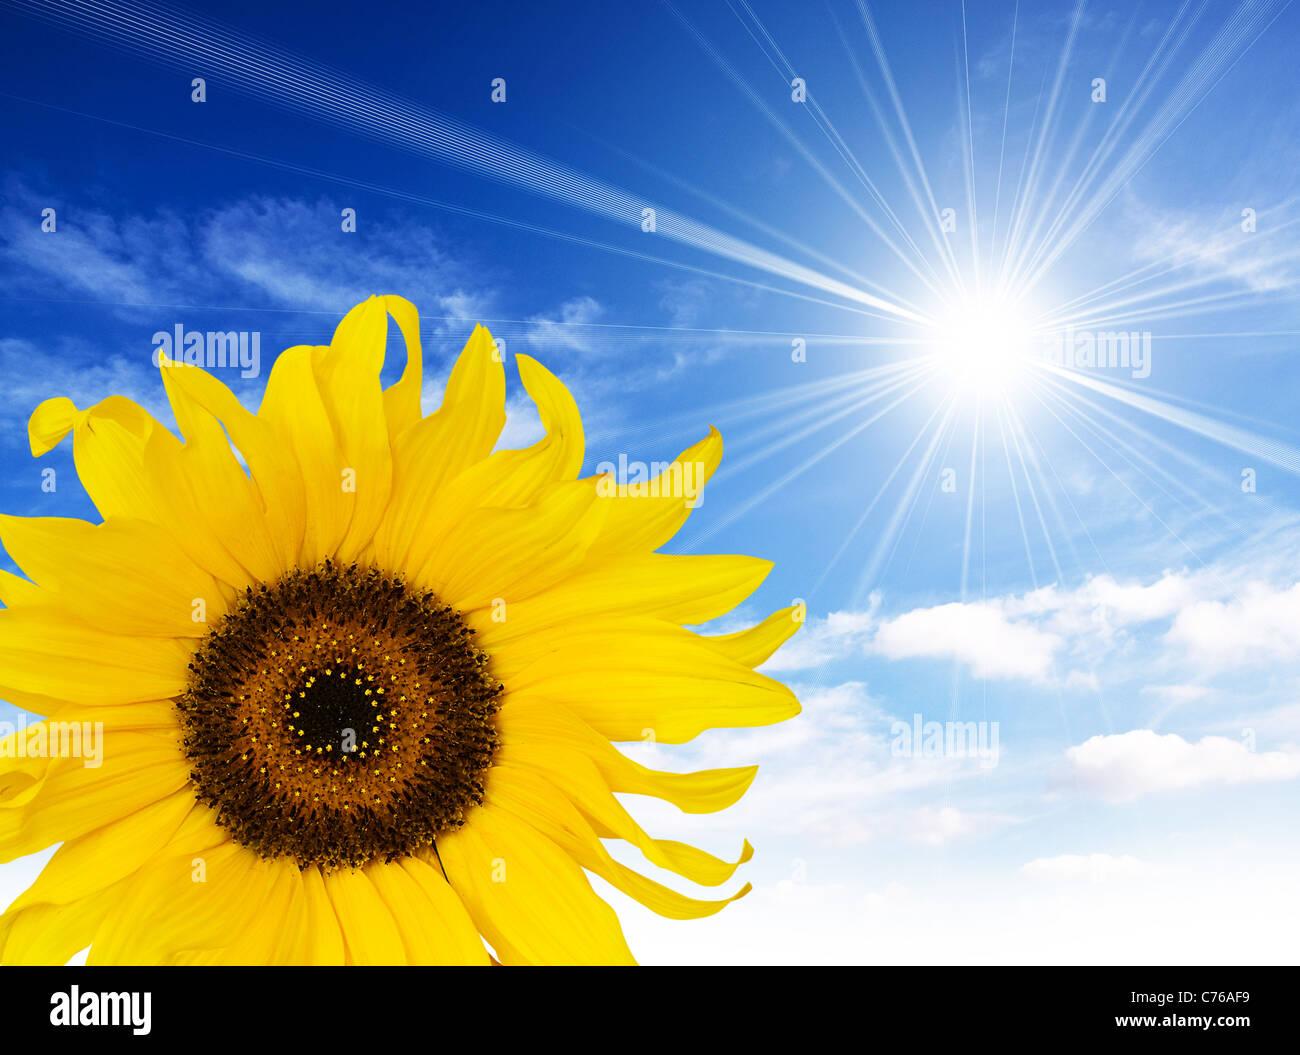 sunflower sunshine - Stock Image